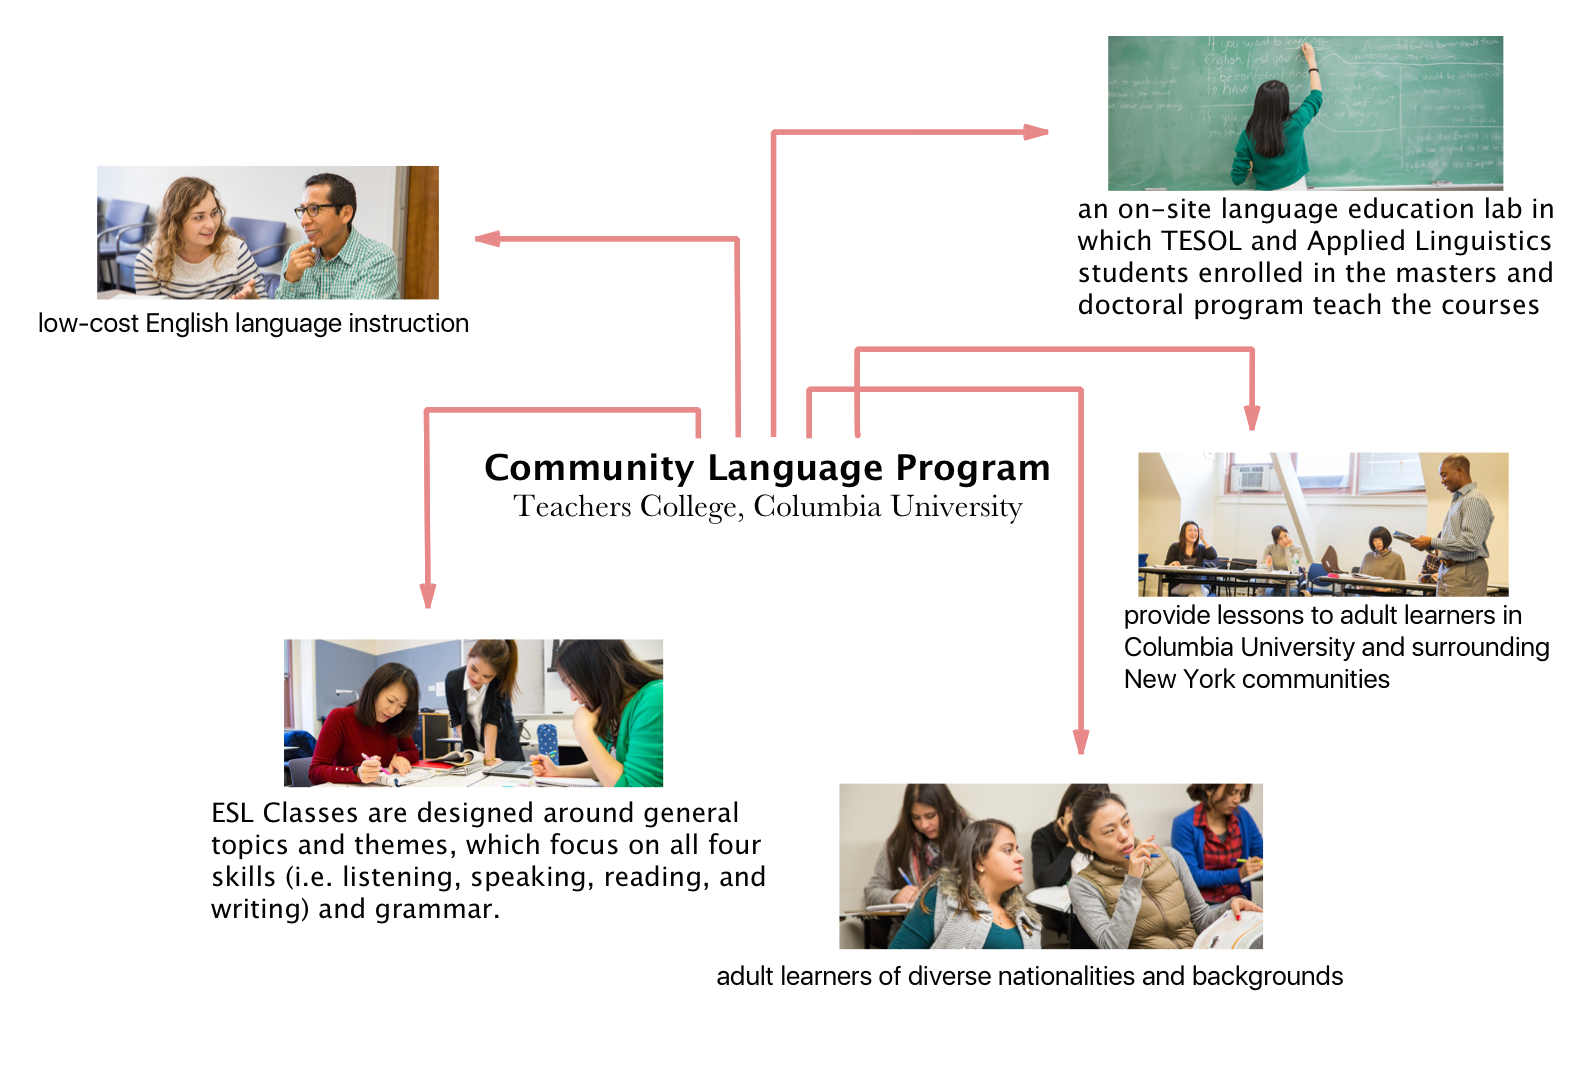 Community Language Program @ Teachers College, Columbia University